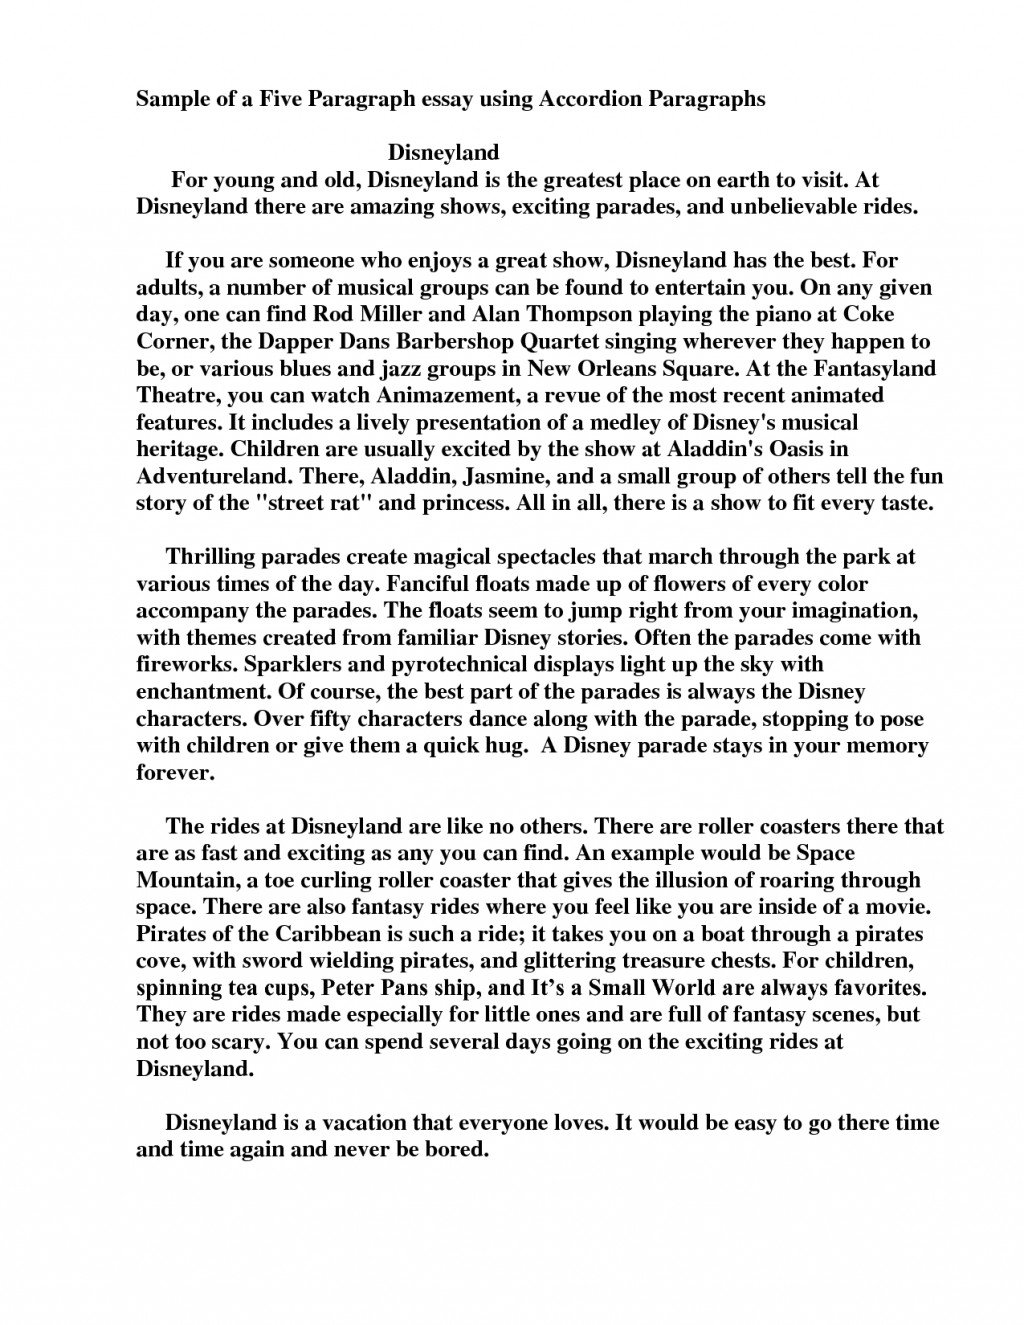 004 Format Of Paragraph Essay Inspirational Sample Five Stirring 5 Free Outline Template Printable Argumentative Large